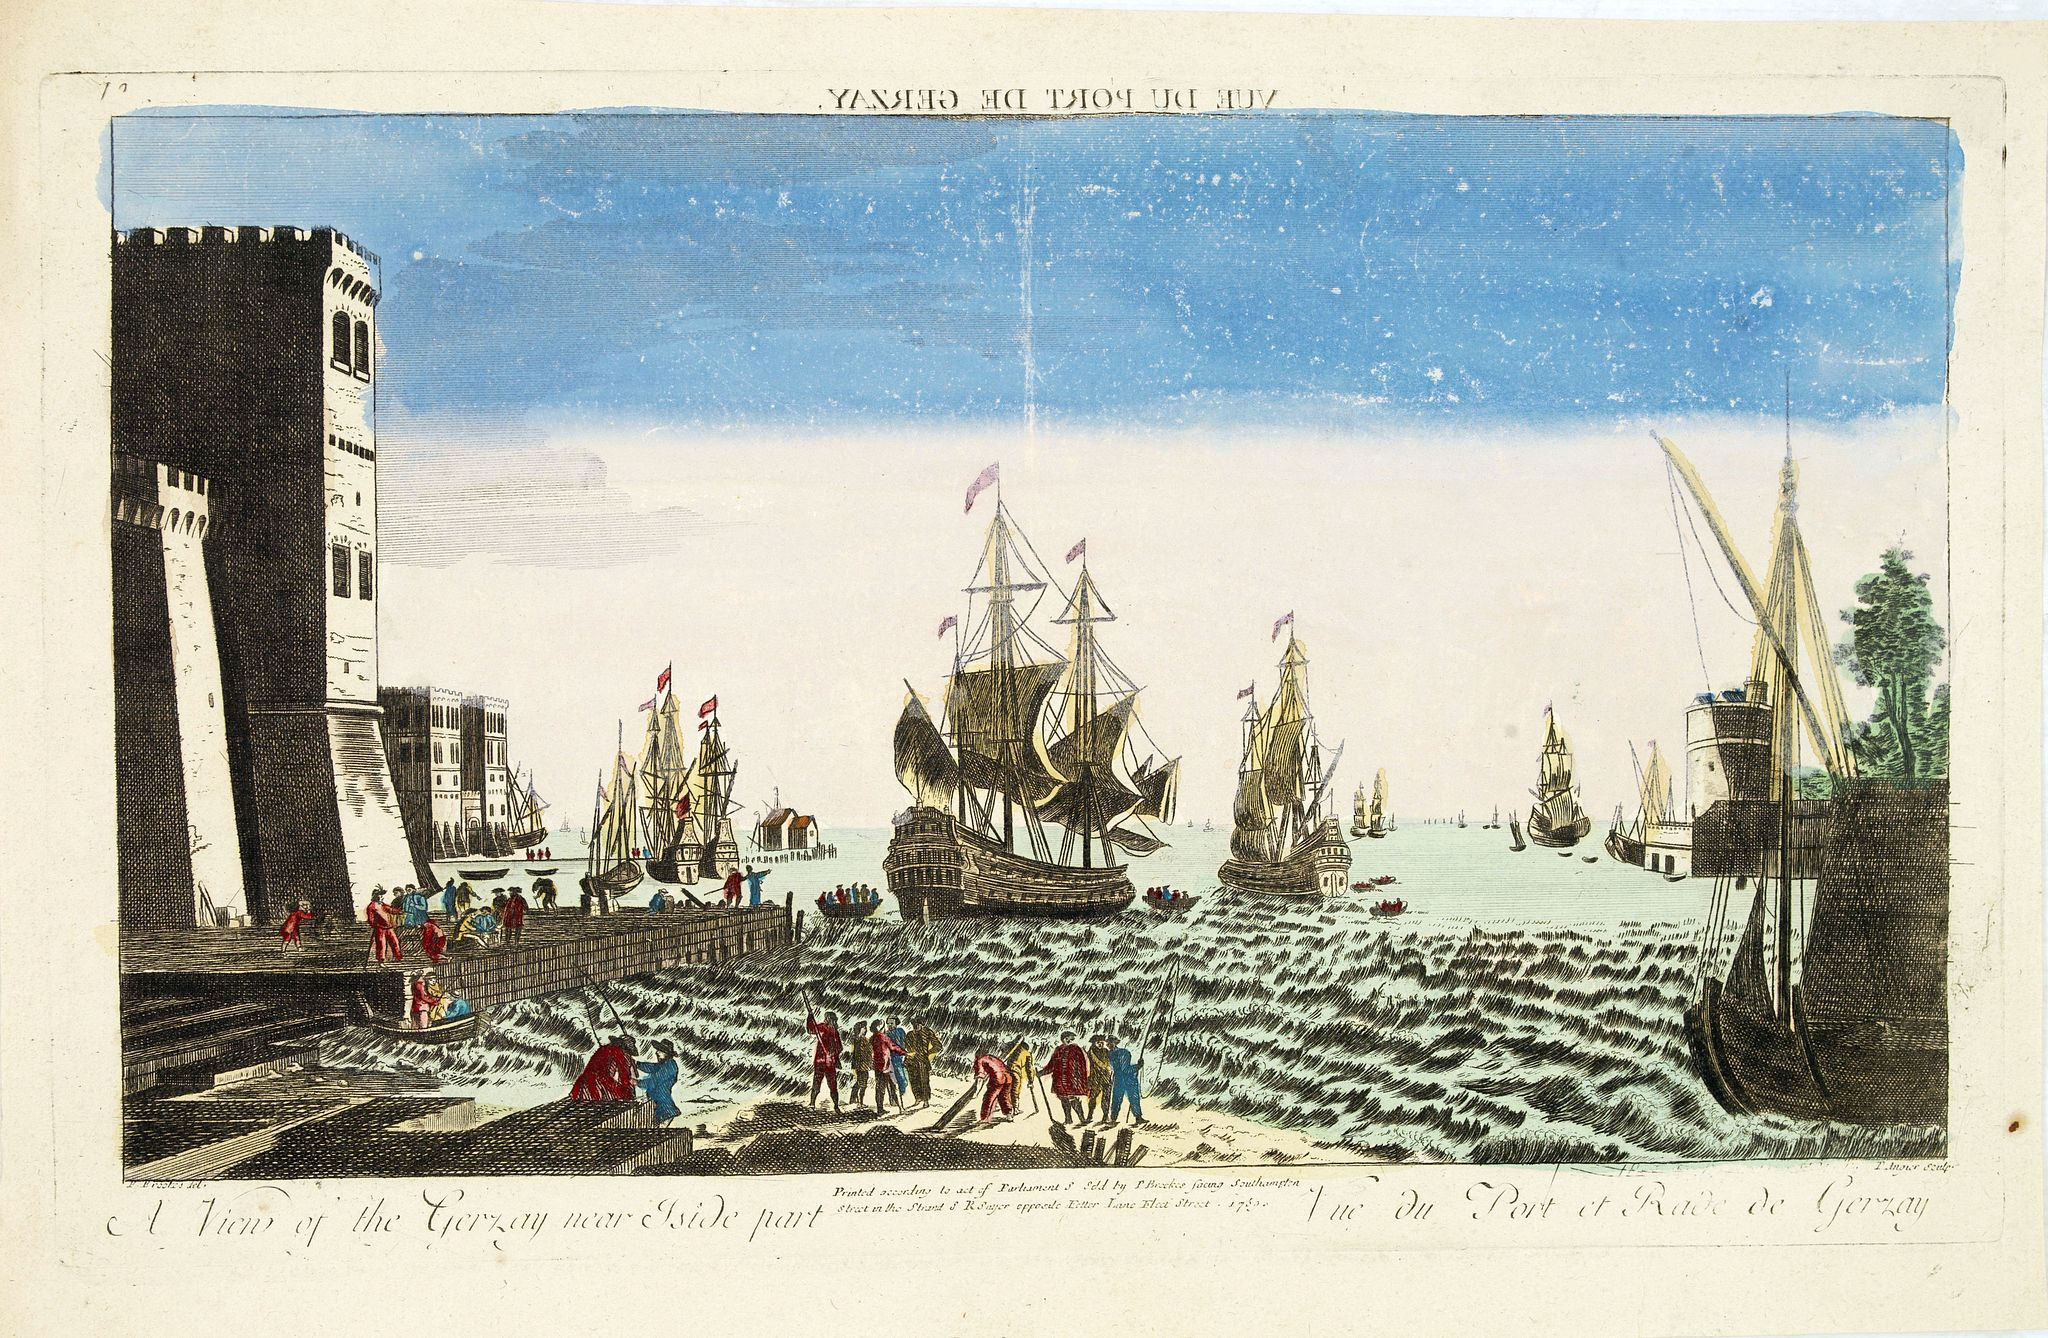 SAYER, R. -  A view of the Gerzay near Iside part. / Vue du port et rade de Gerzay.